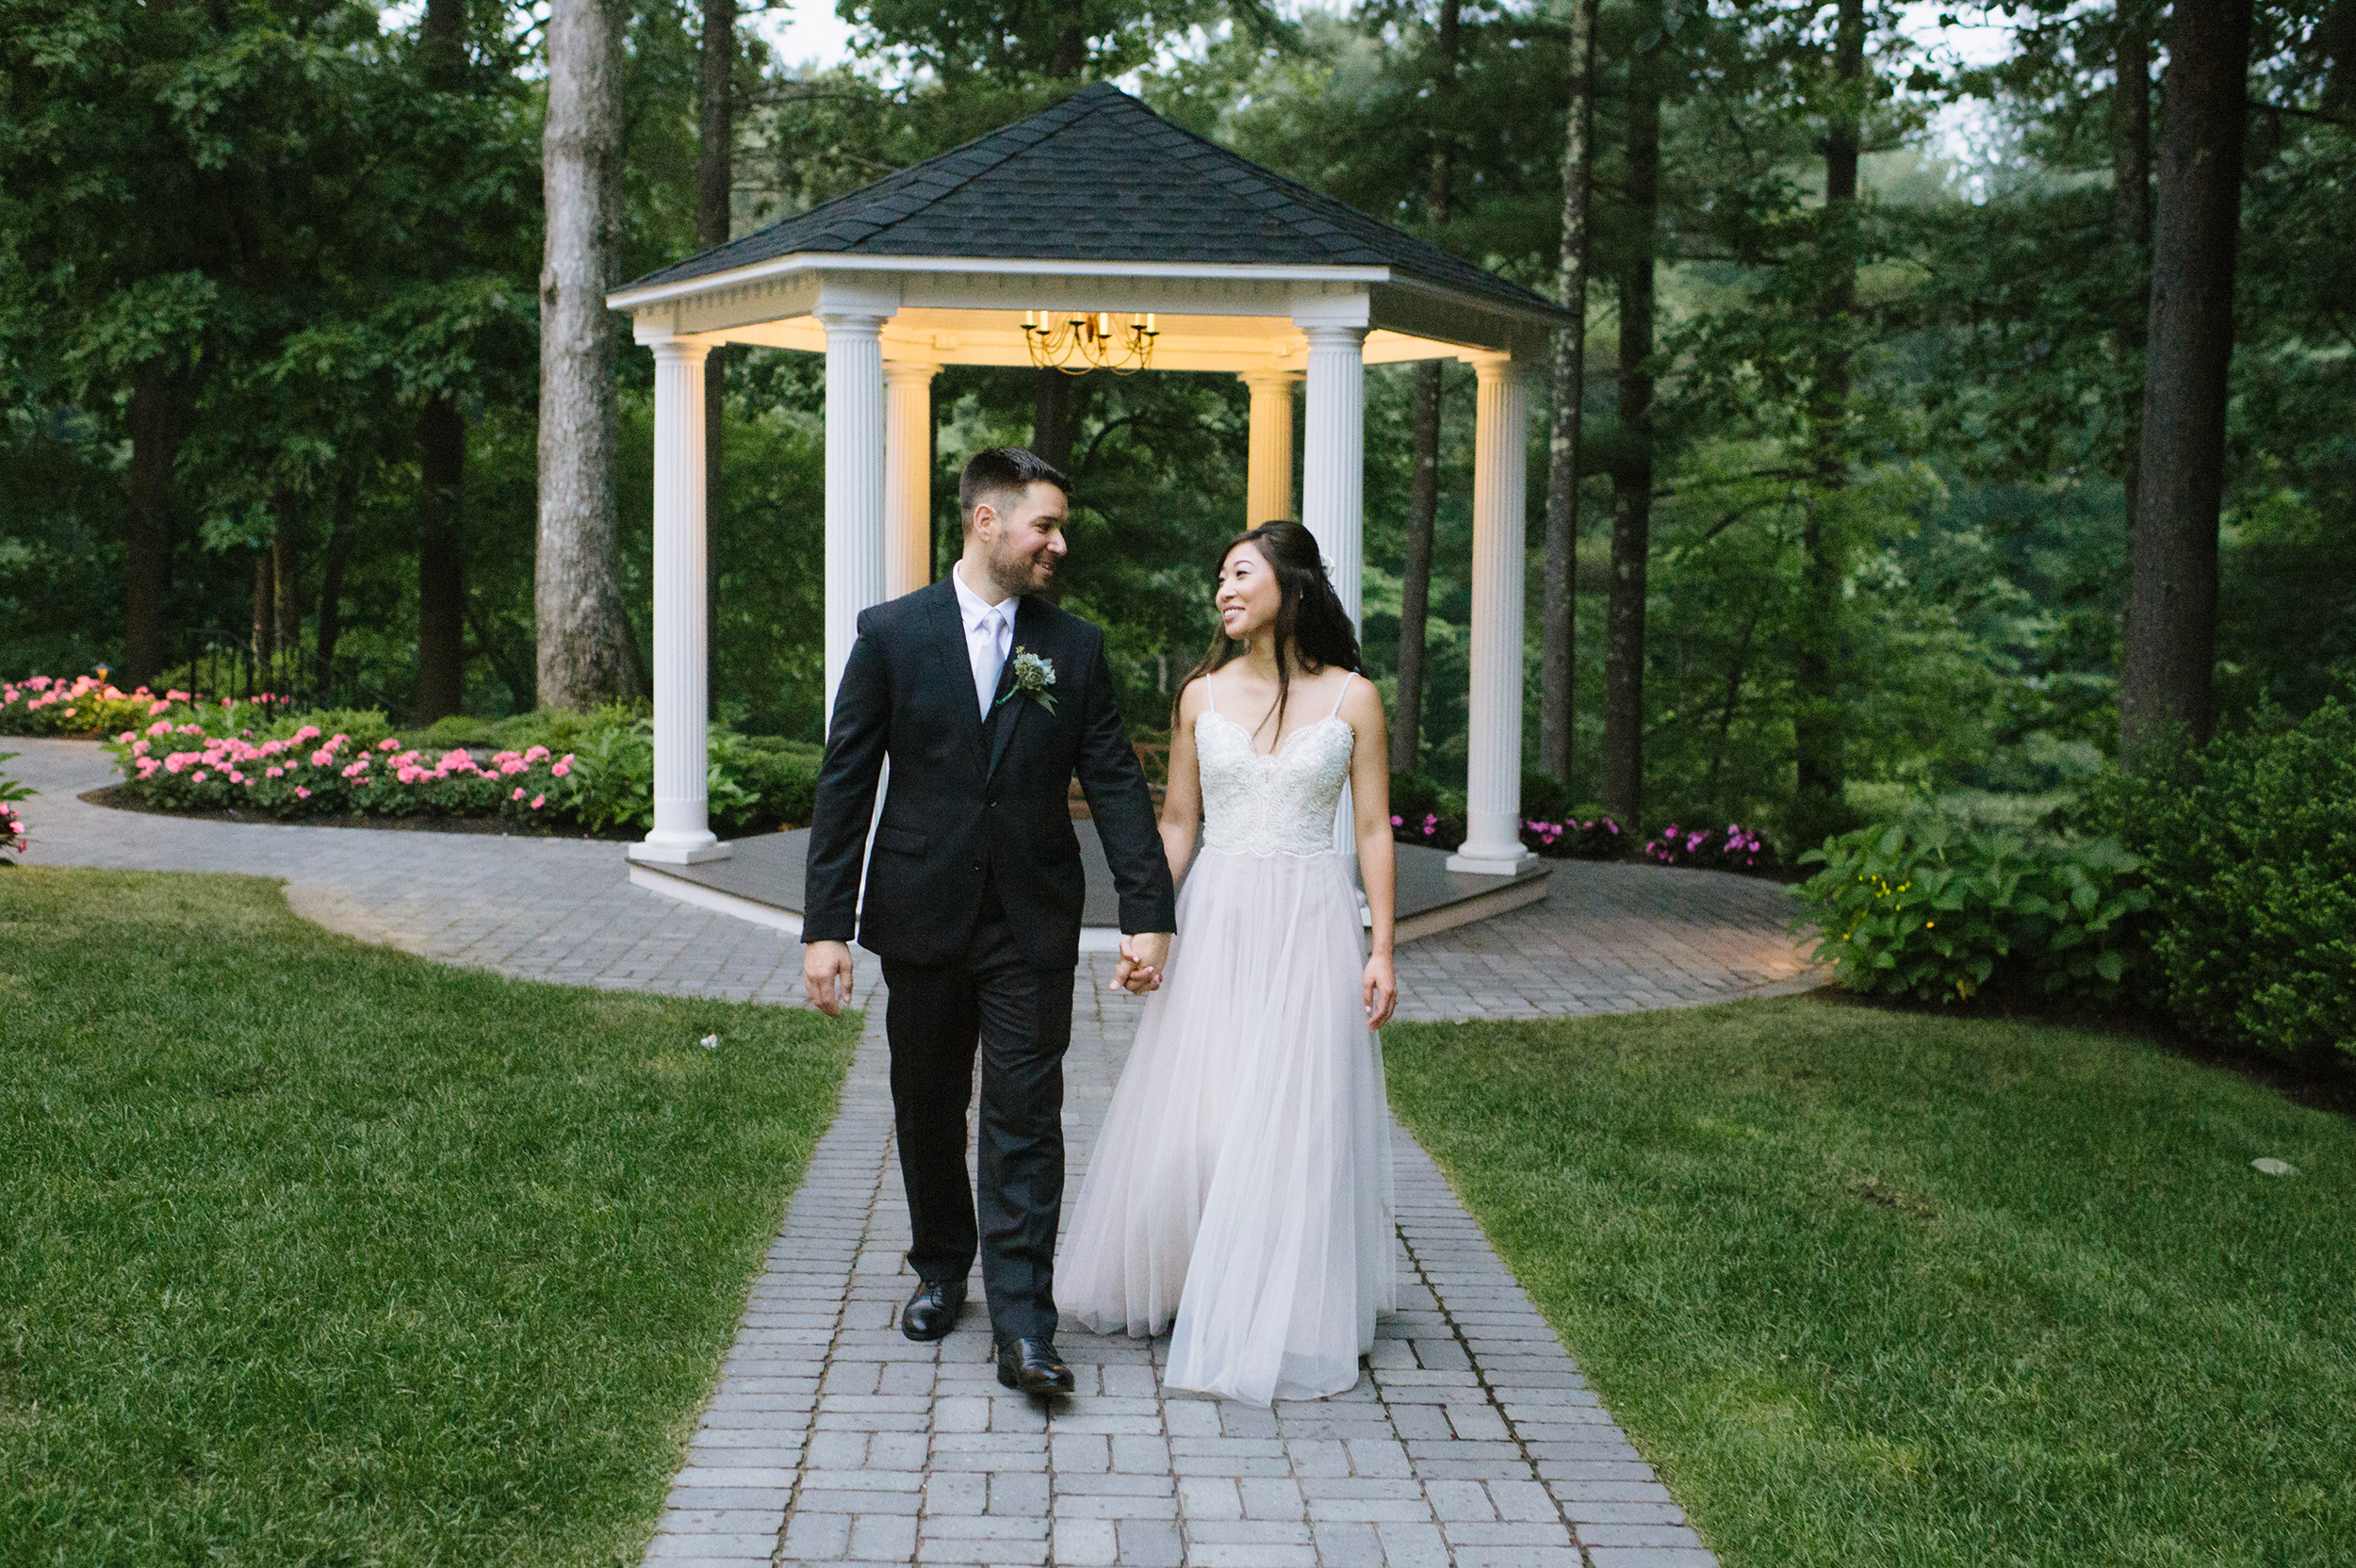 Lakeview-Pavilion-Wedding003.jpg